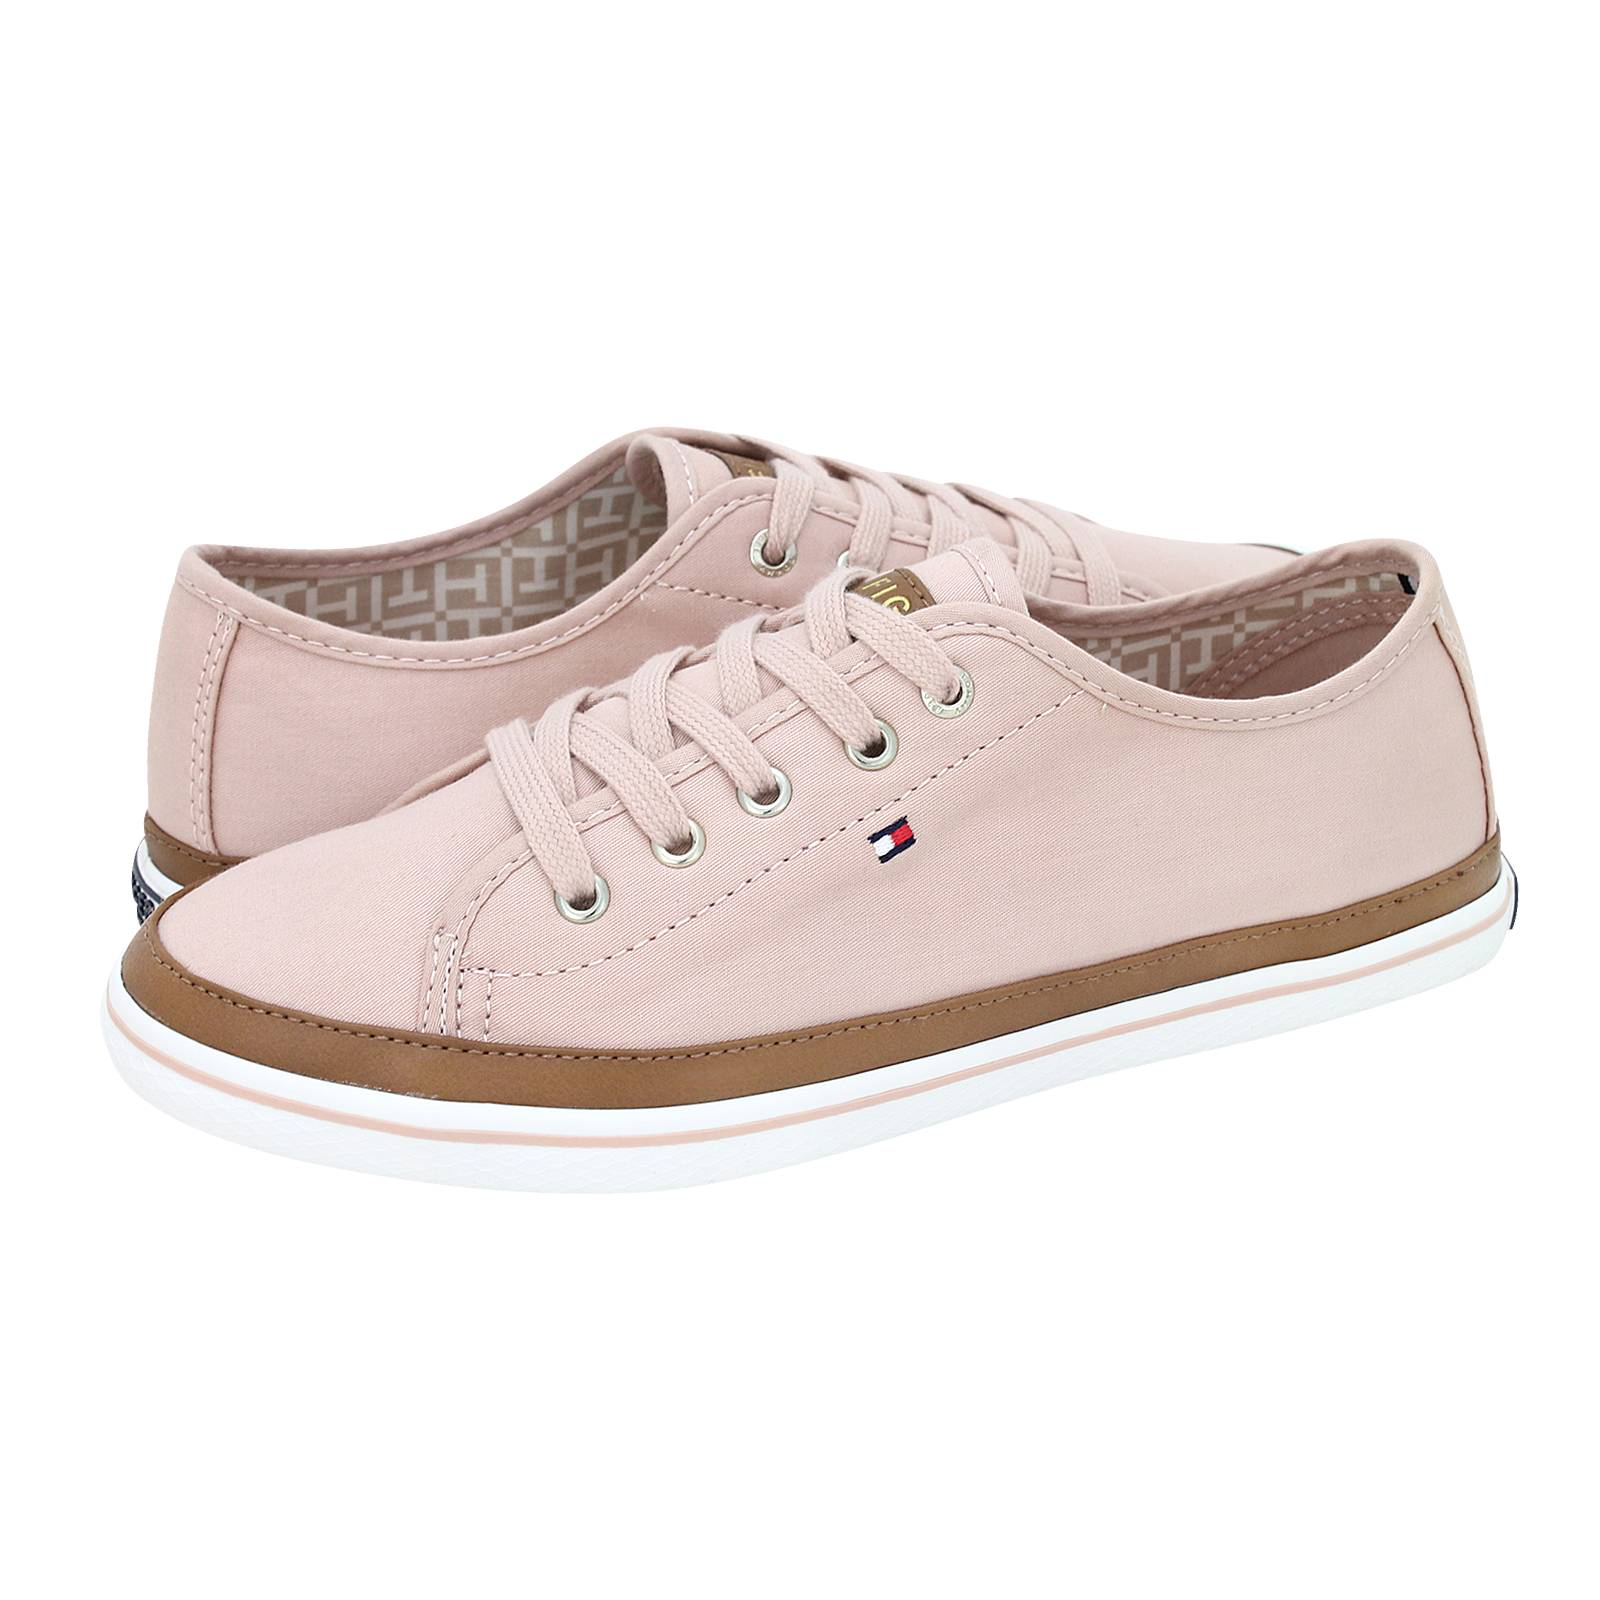 Iconic Kesha Sneaker - Γυναικεία παπούτσια casual Tommy Hilfiger από ... 309d1a2b7f0